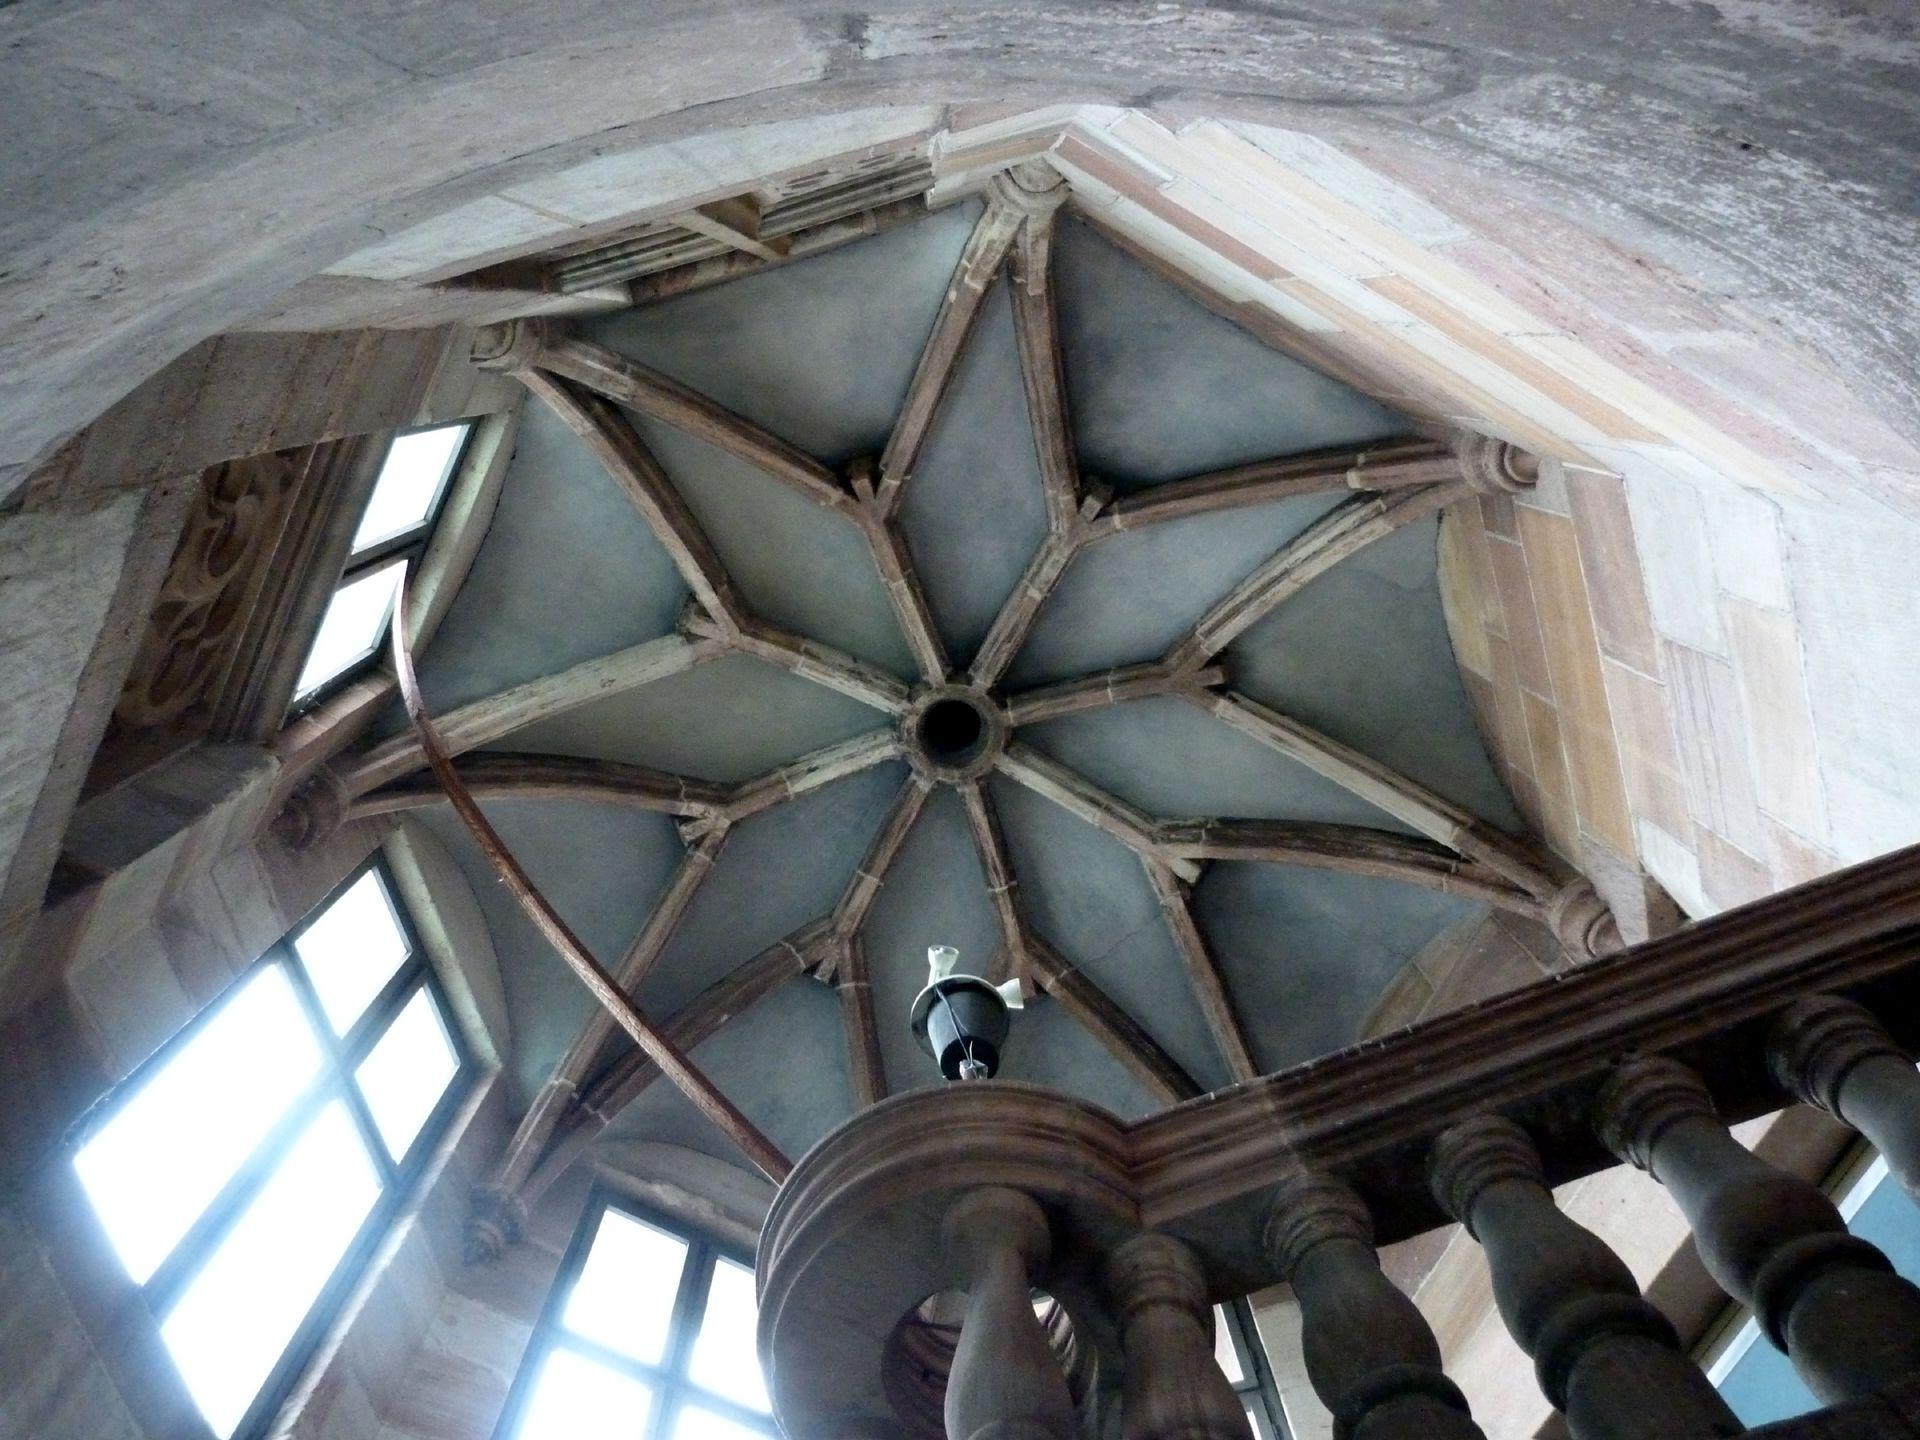 Peller House Stairwell, star-shaped ribbed vault / 1605